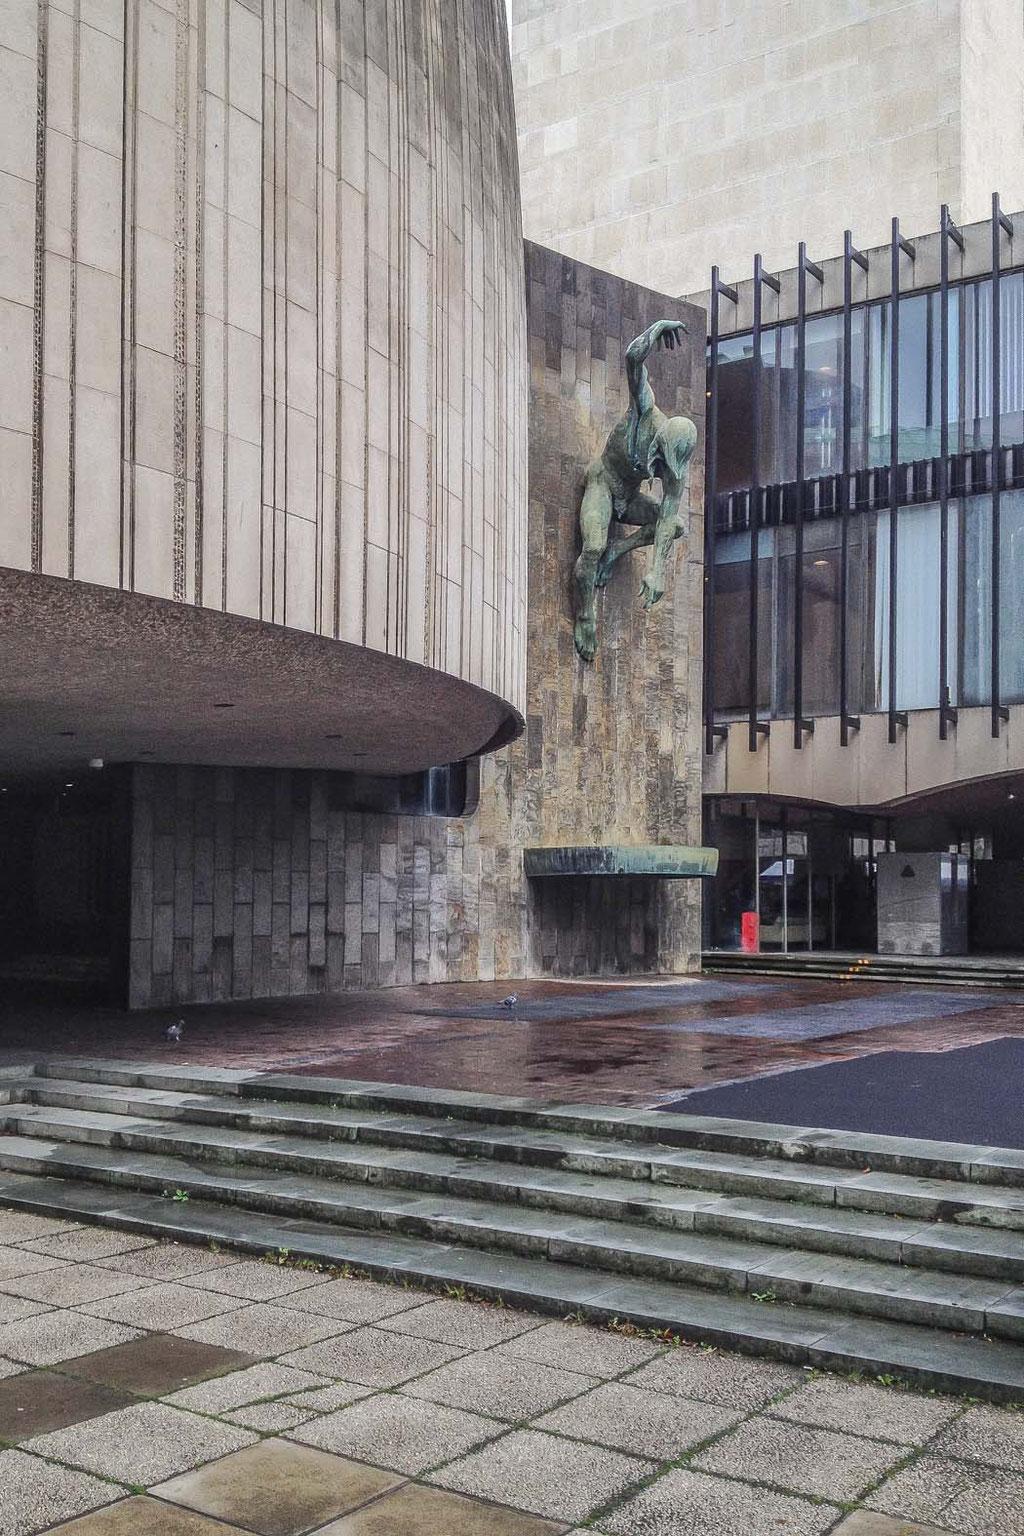 Newcastle Civic Centre (George Kenyon), Newcastle upon Tyne (UK)